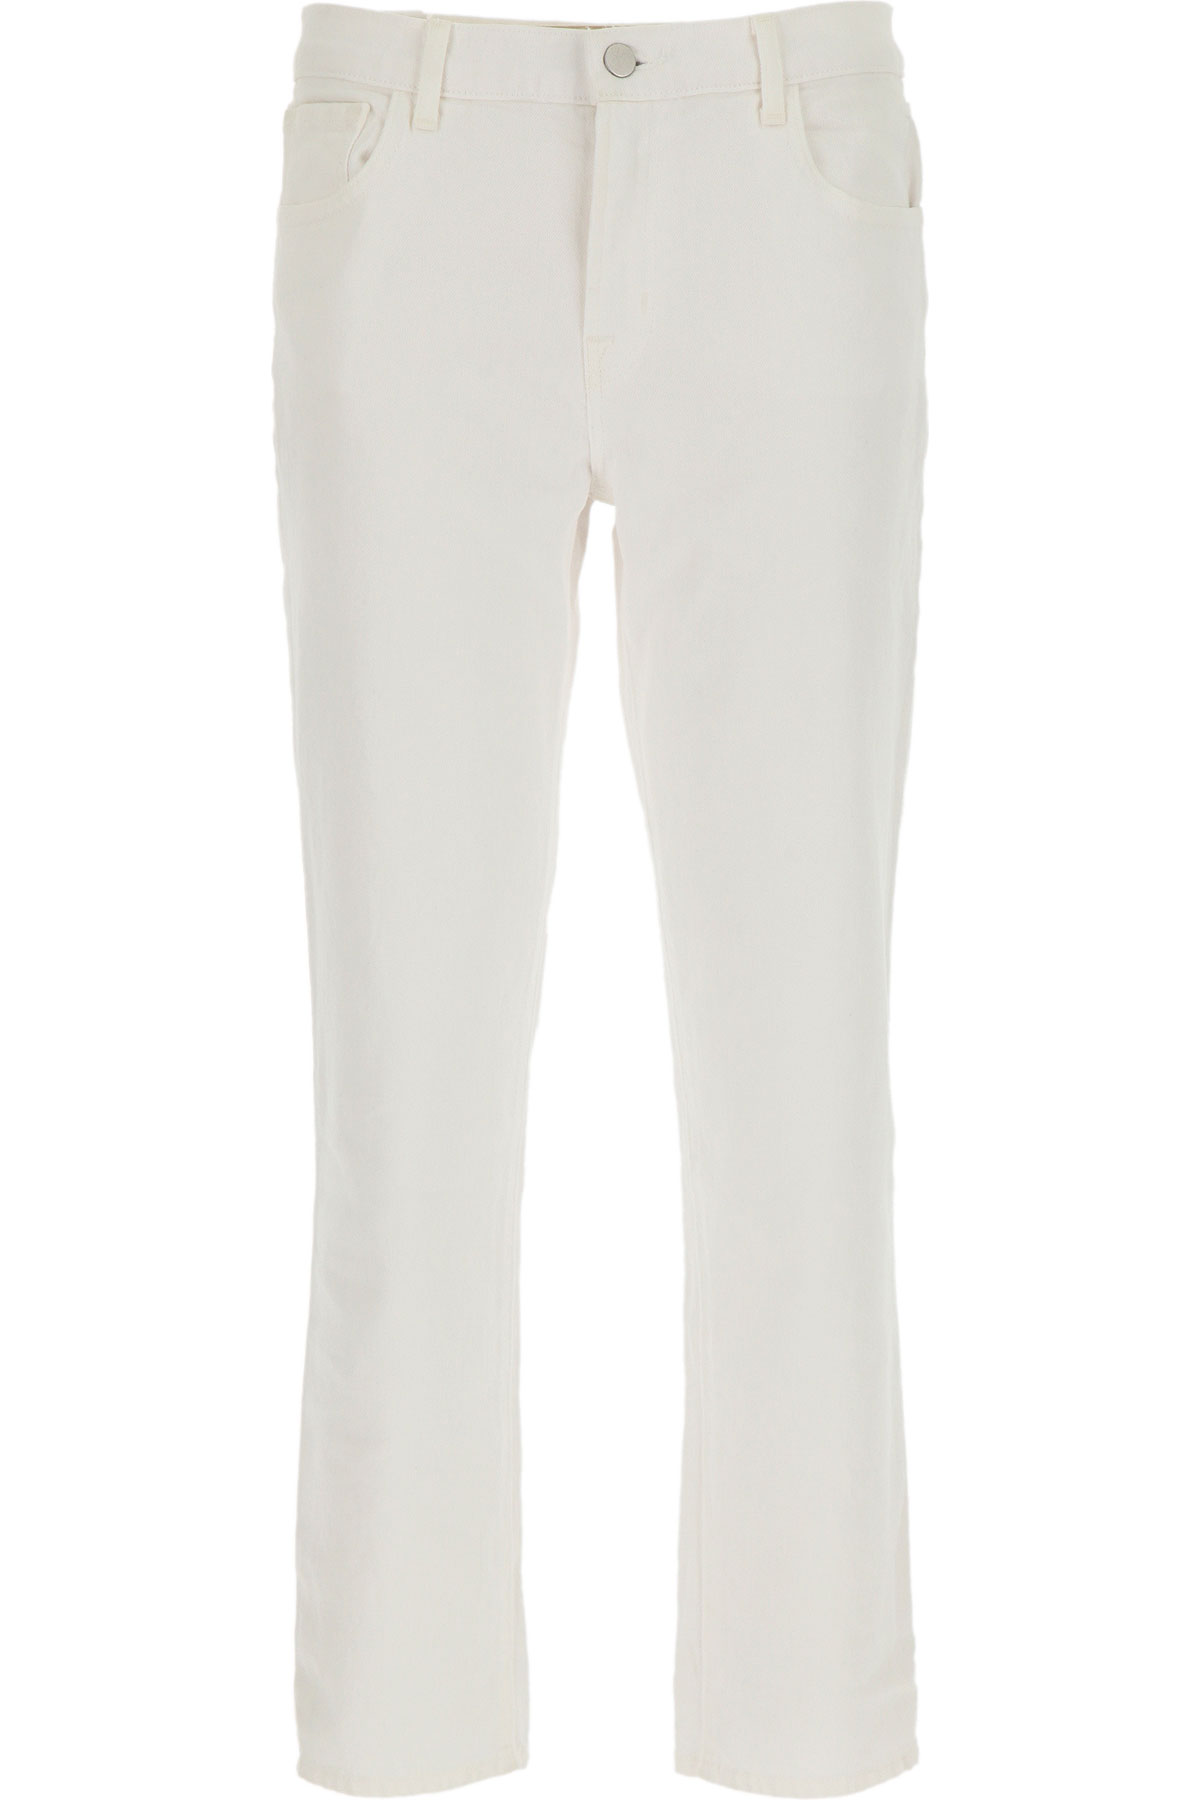 J Brand Jeans On Sale, White, Cotton, 2019, 26 27